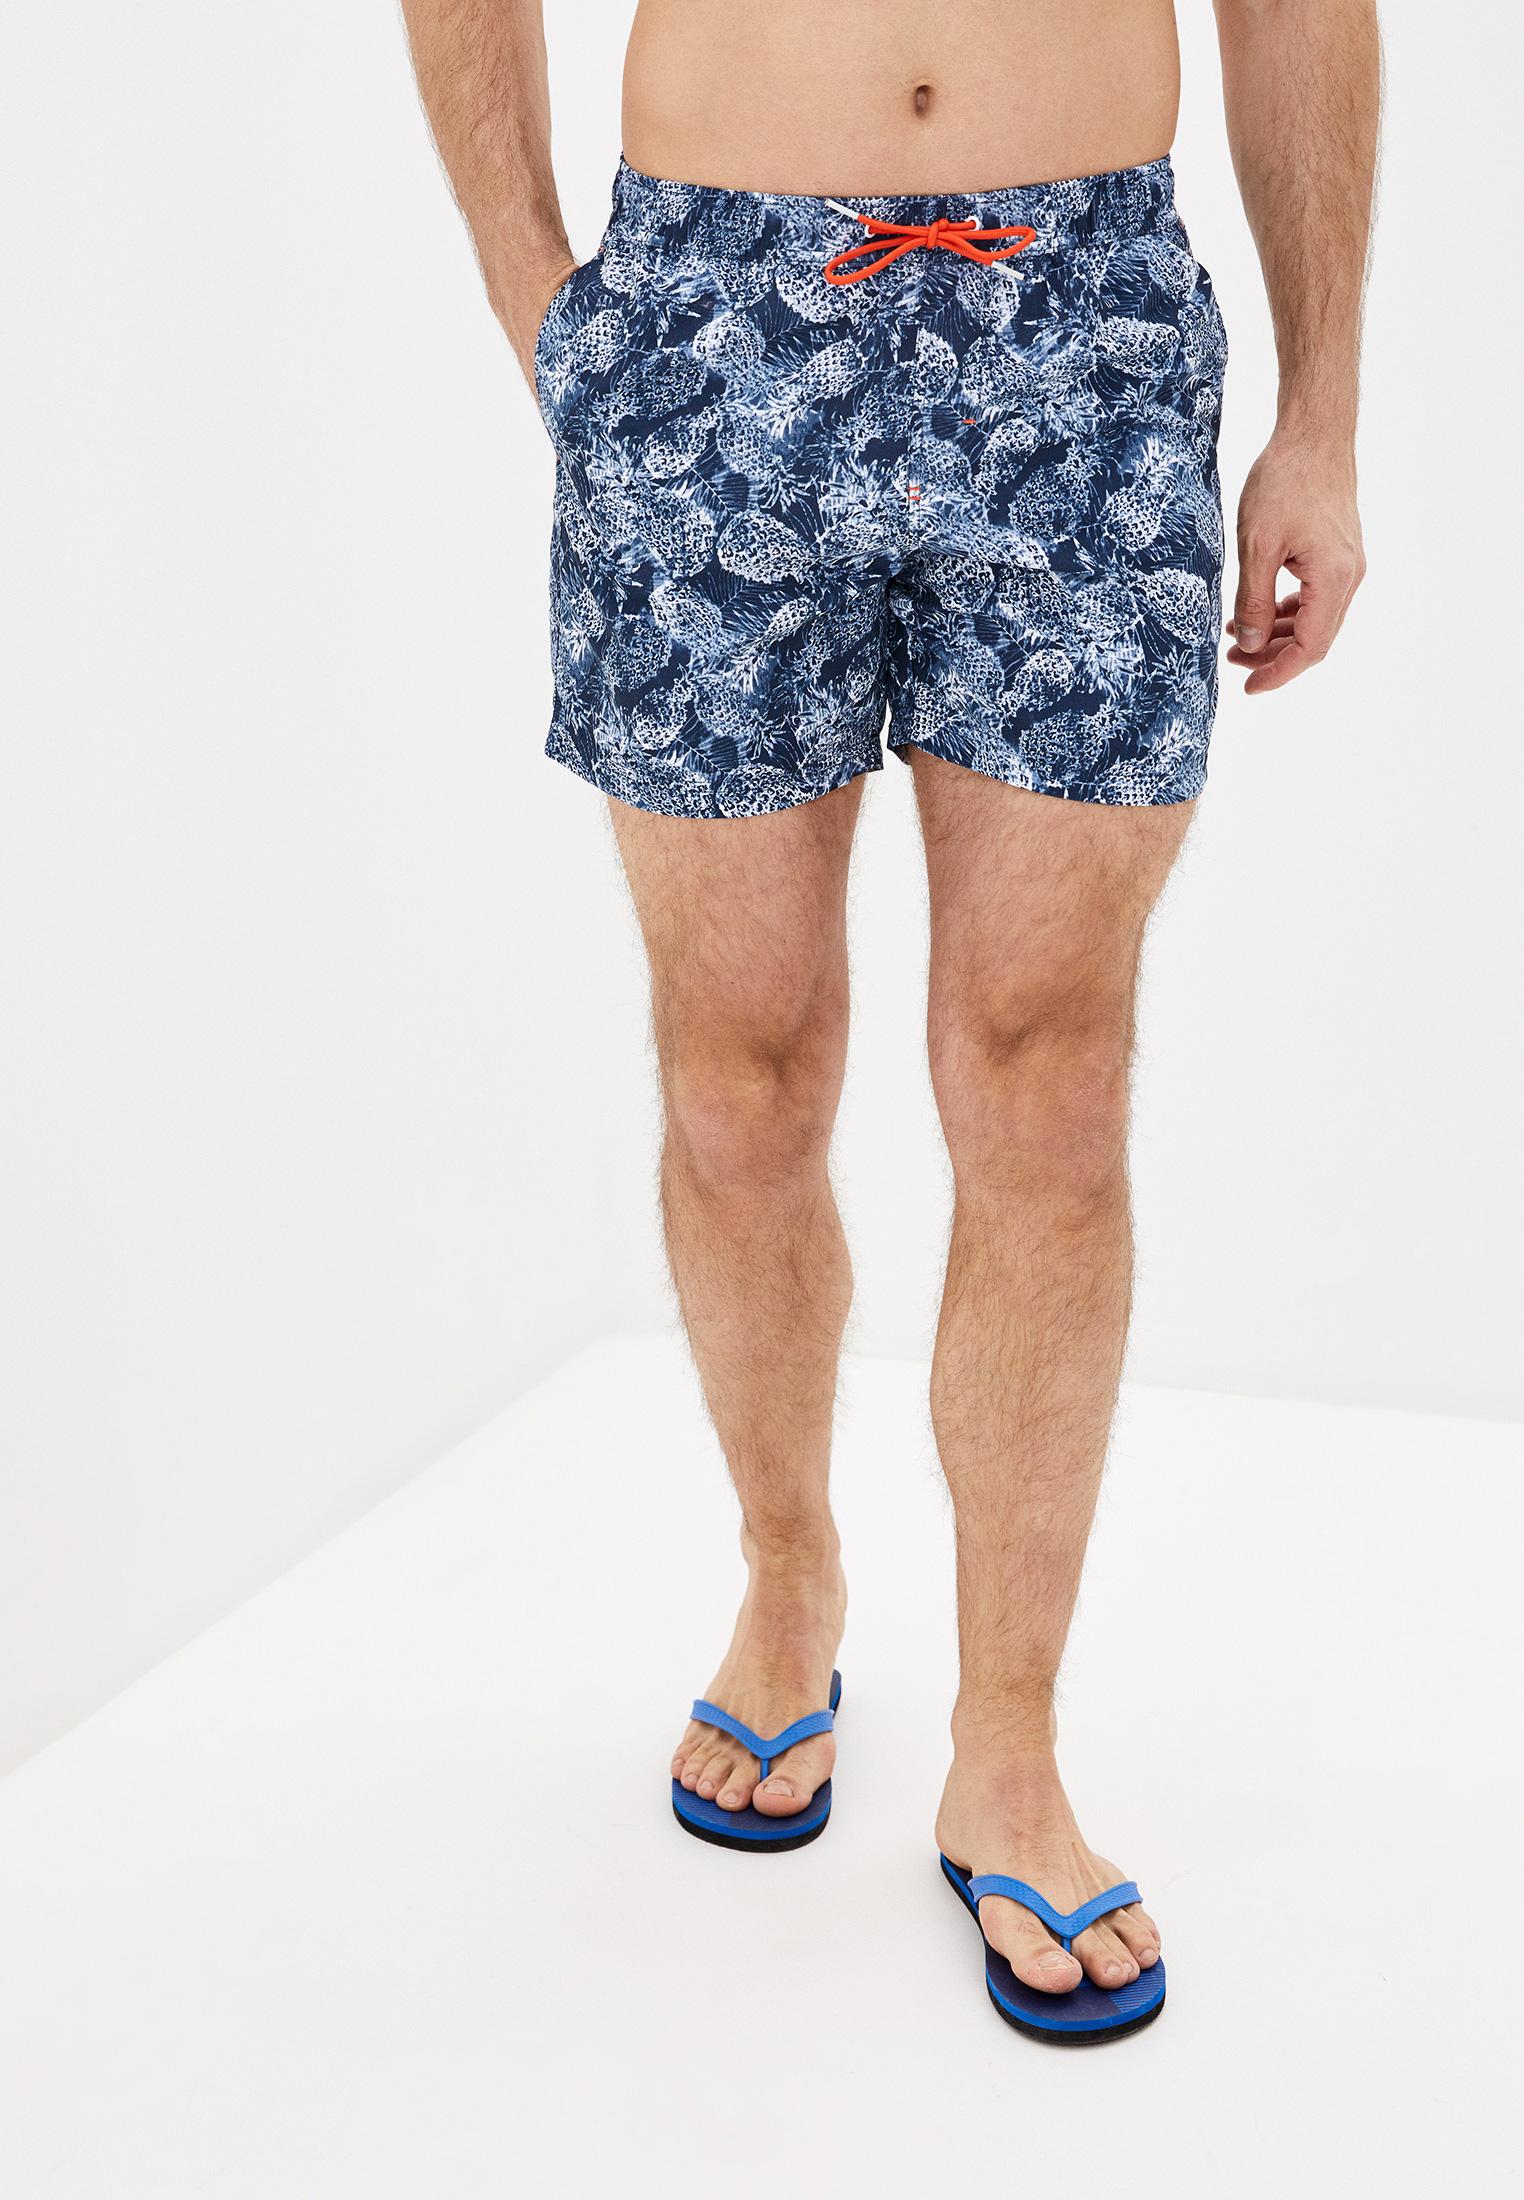 Мужские шорты для плавания SPRINGFIELD 597074